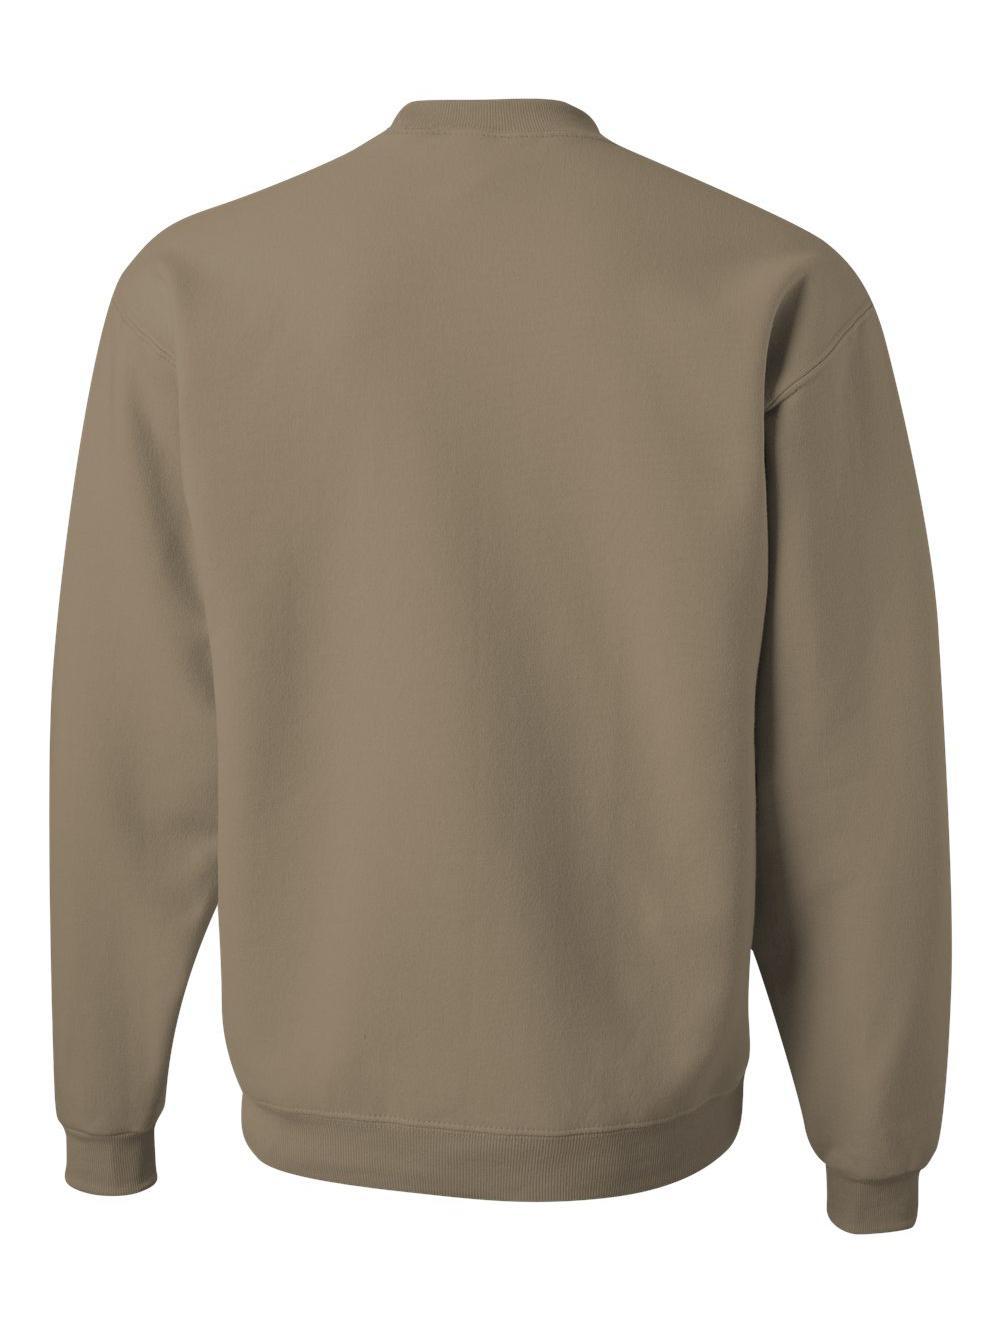 Jerzees-NuBlend-Crewneck-Sweatshirt-562MR thumbnail 52